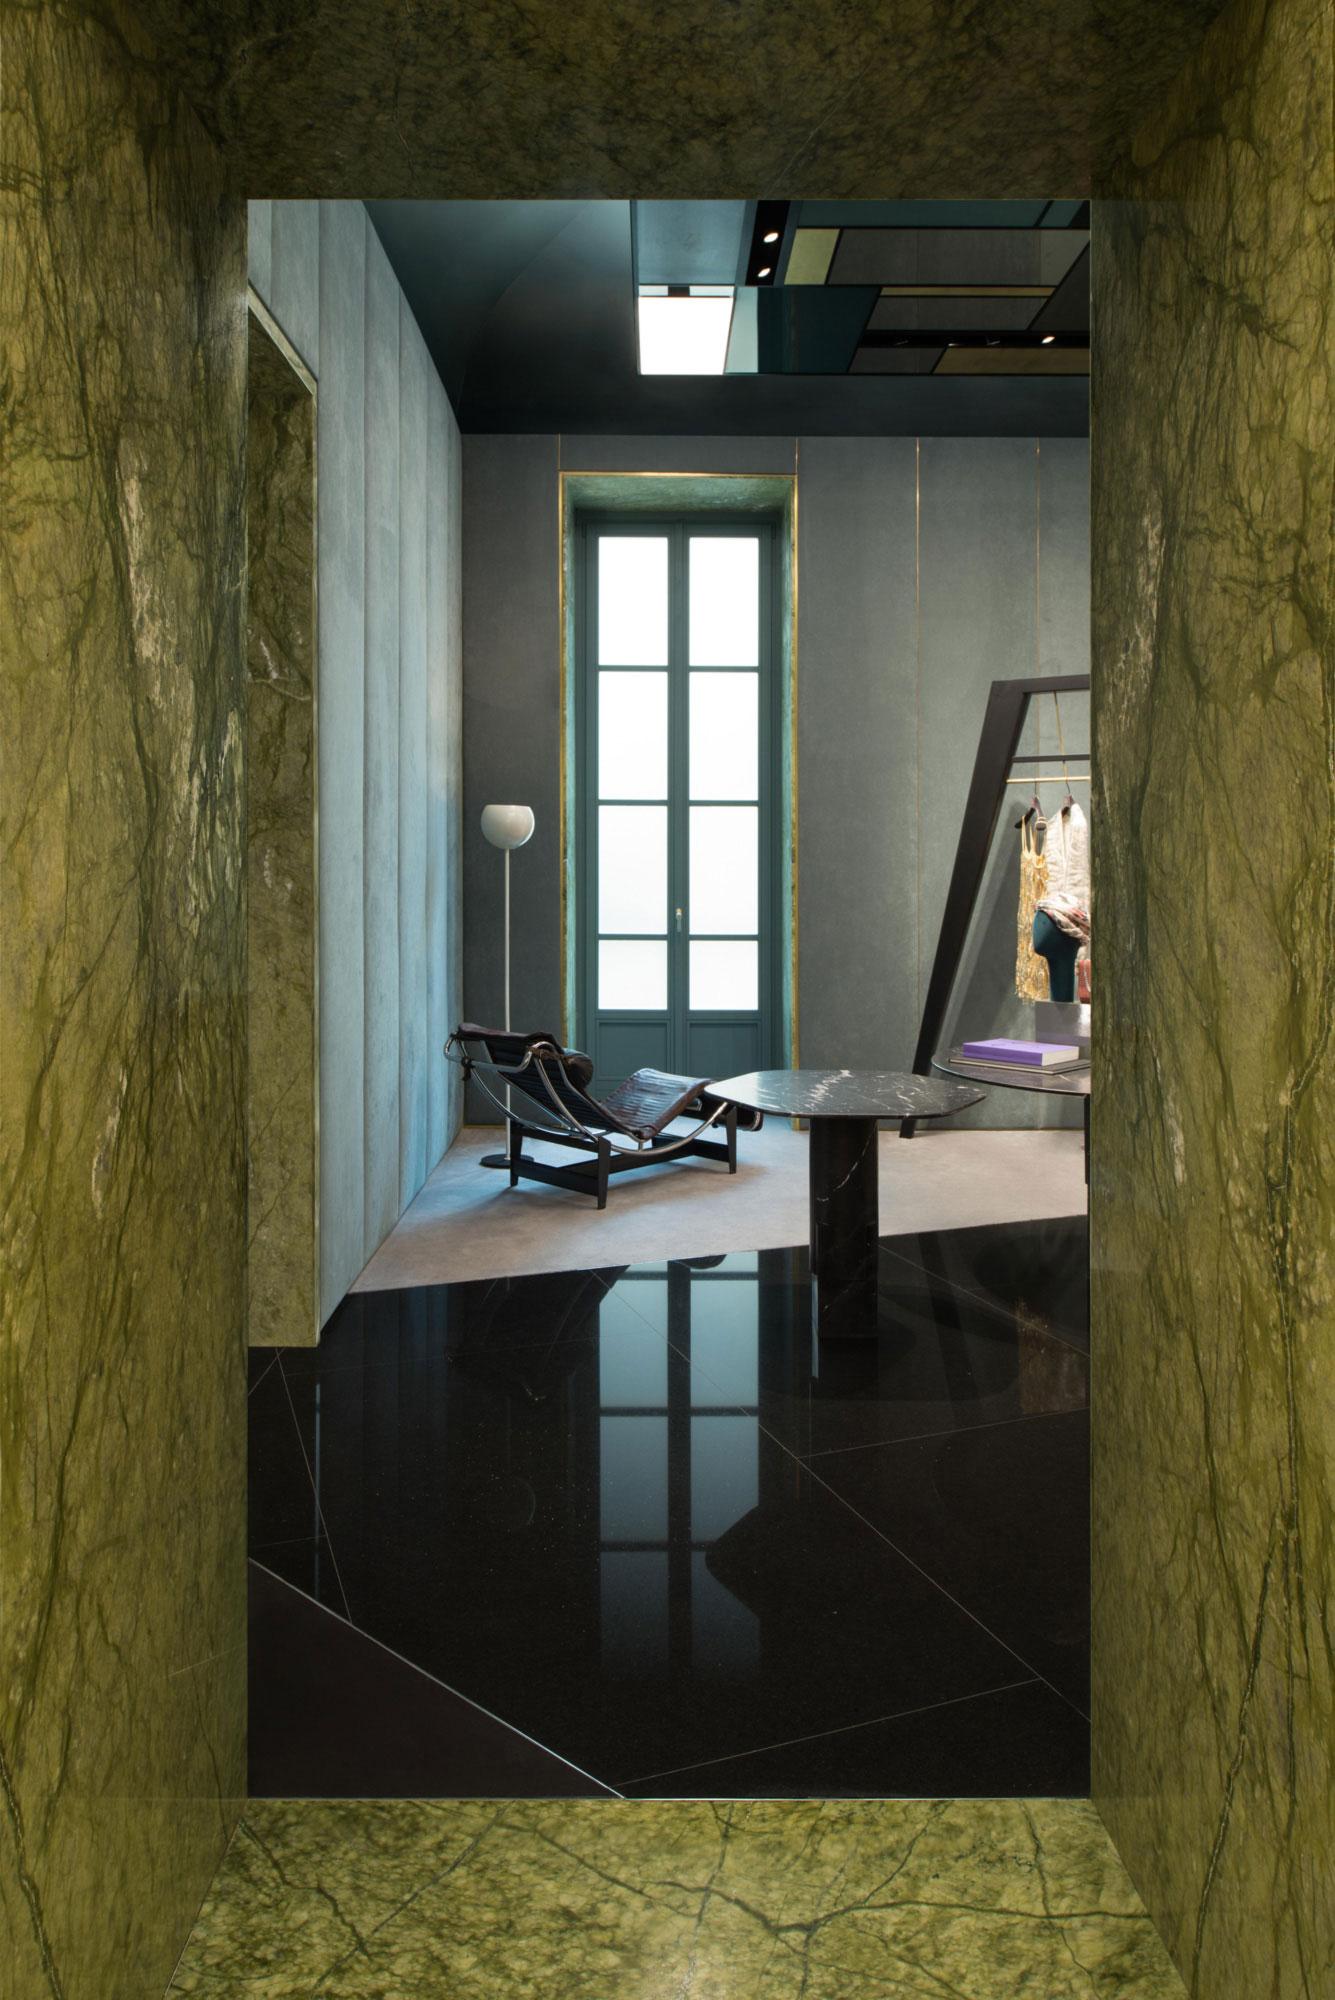 luxury boutique lagrange12 in turin italy by dimore studio yellowtrace bloglovin breathe architecture studio yellowtrace